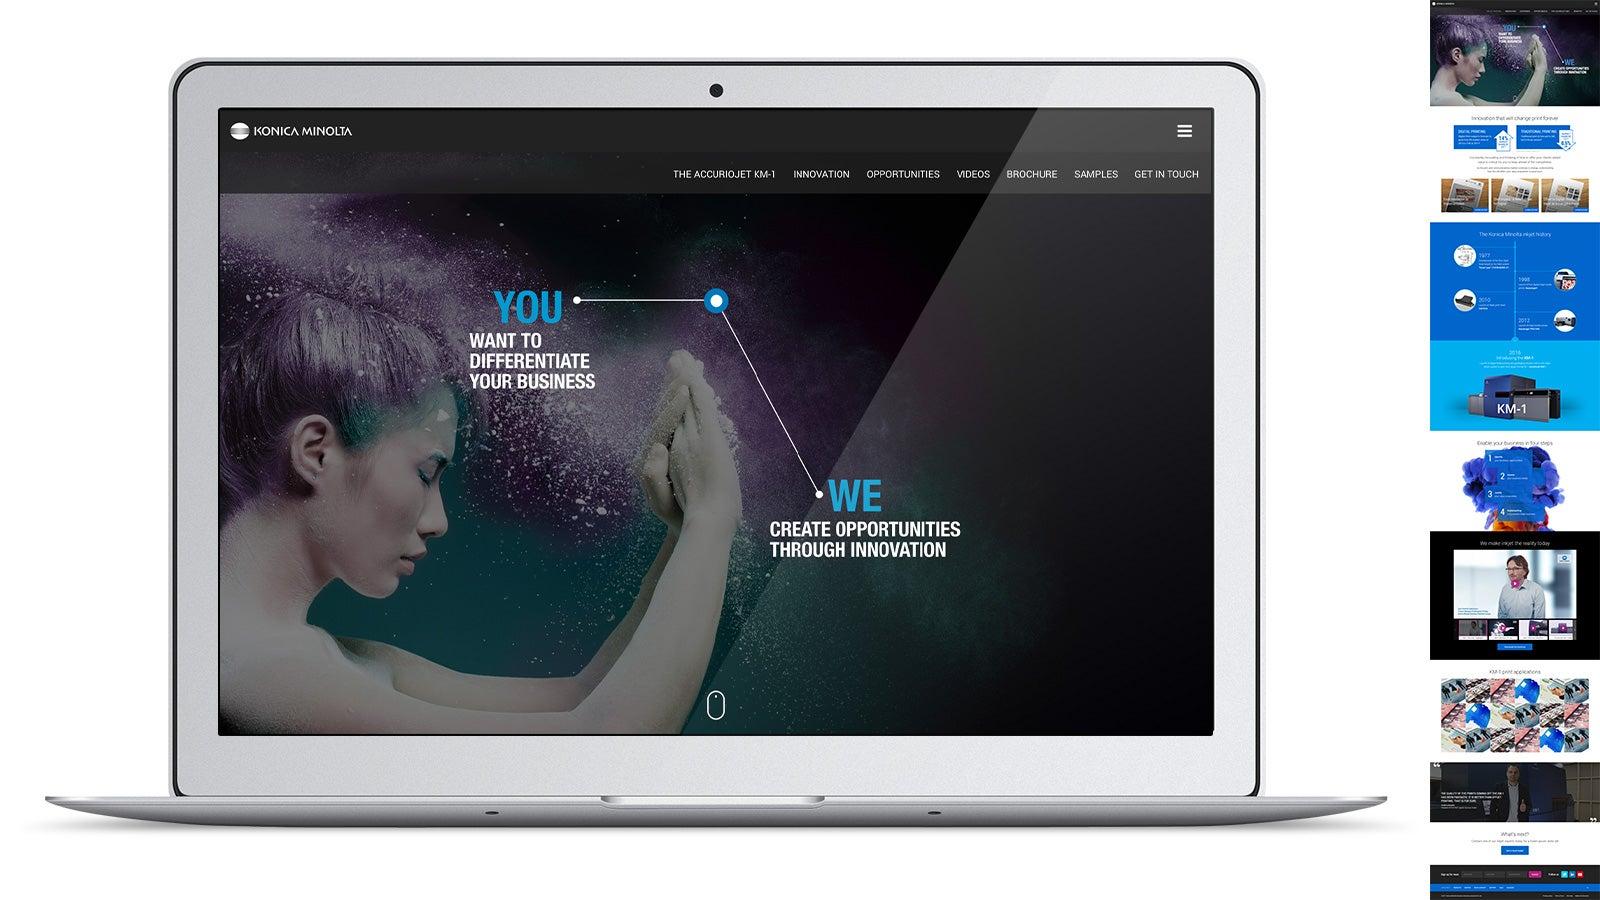 Konica Minolta | homepage on laptop | Devotion